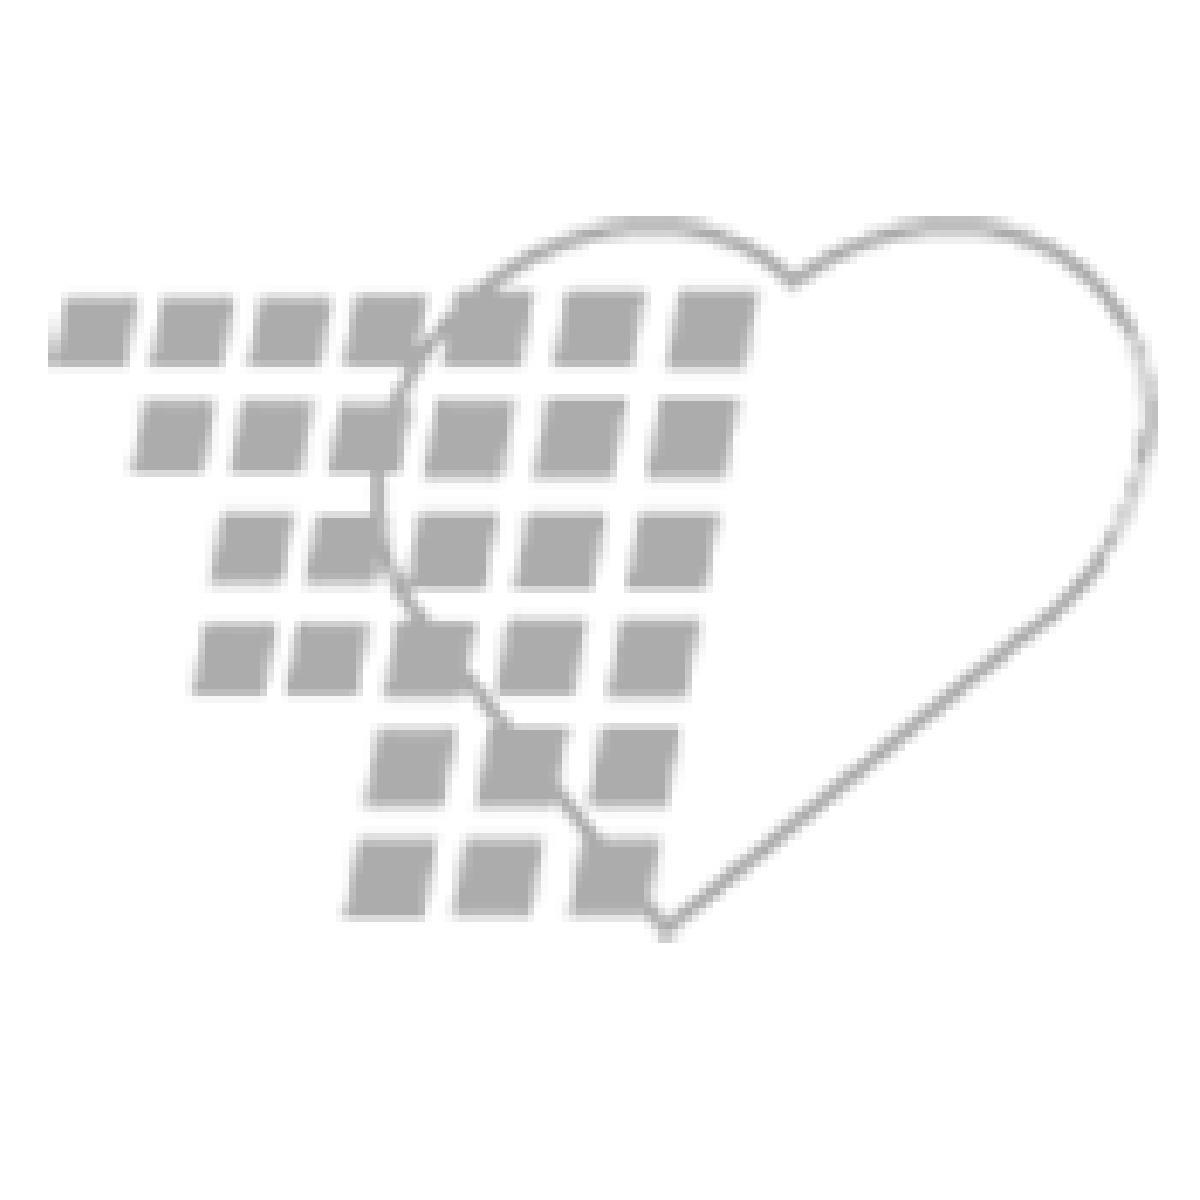 04-25-3127 KbPort™ SimCartRx ™ Elite